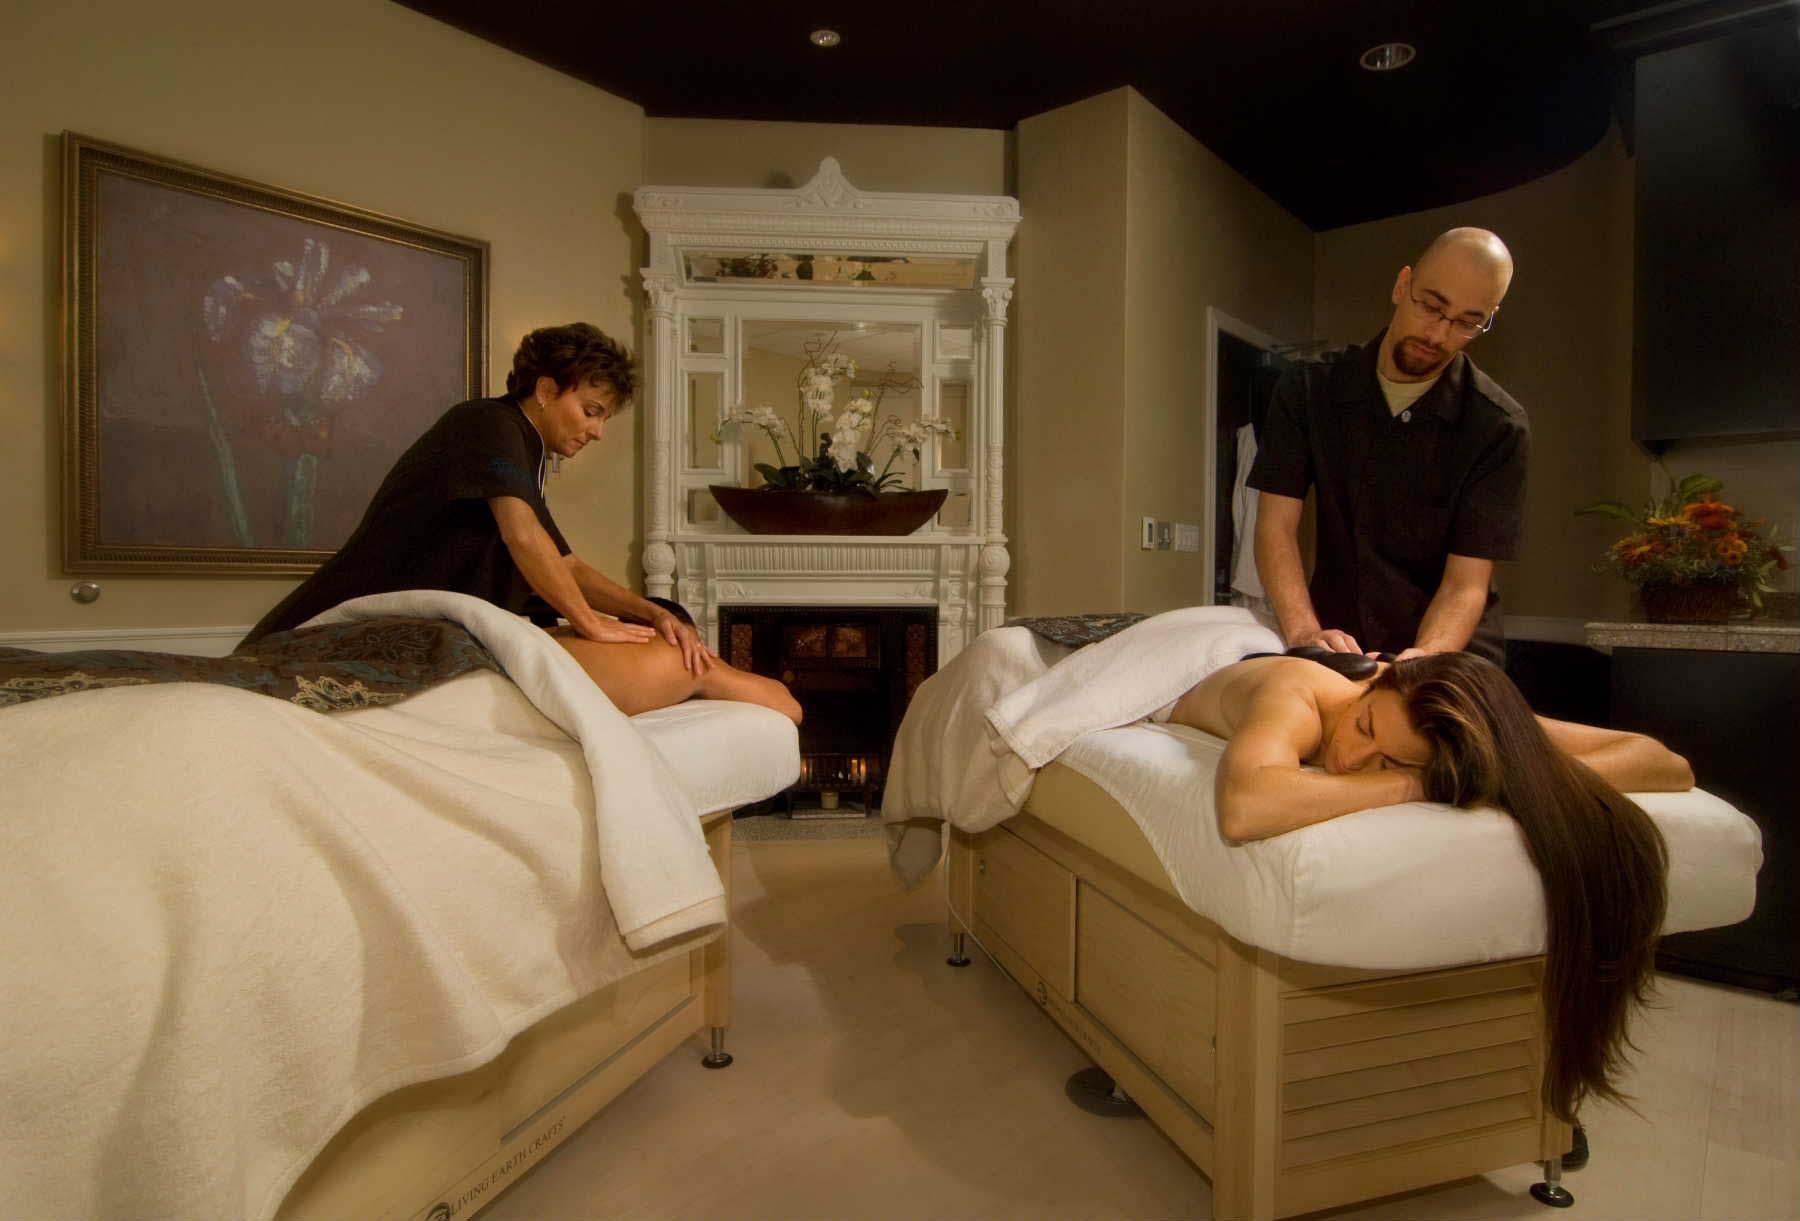 girls for marriage massage siden